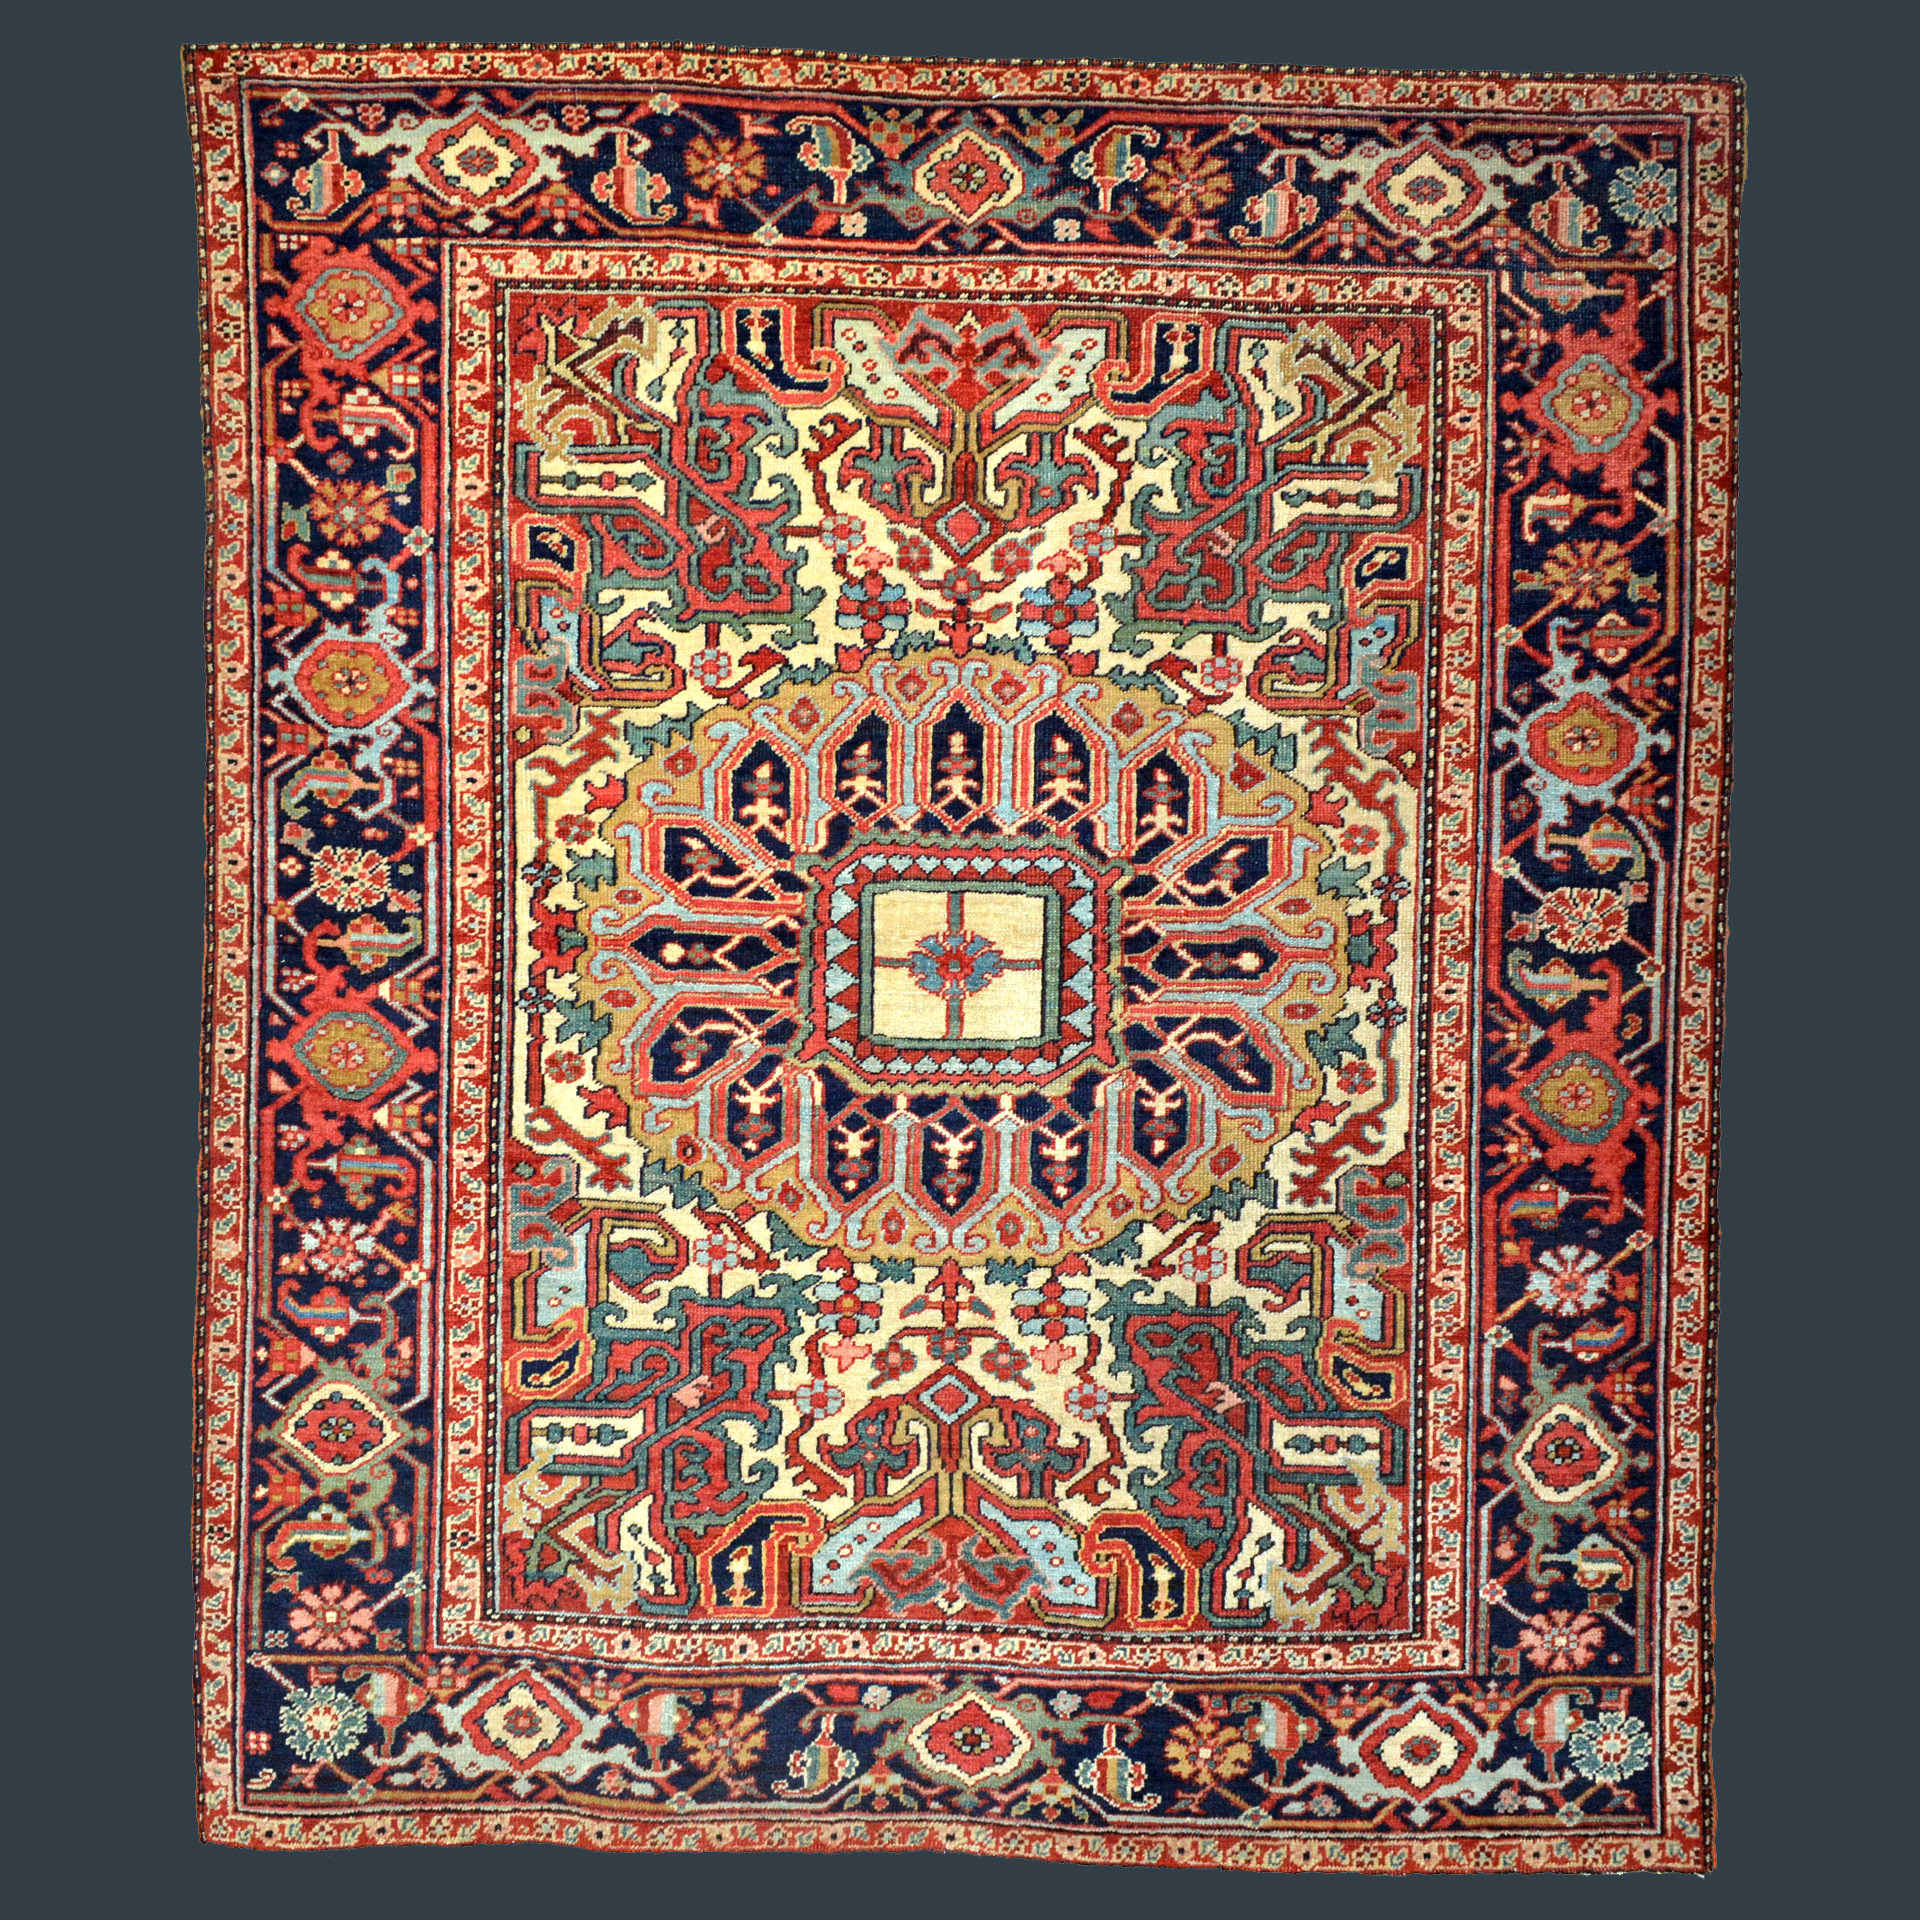 Antique Heriz Serapi rug with ivory field